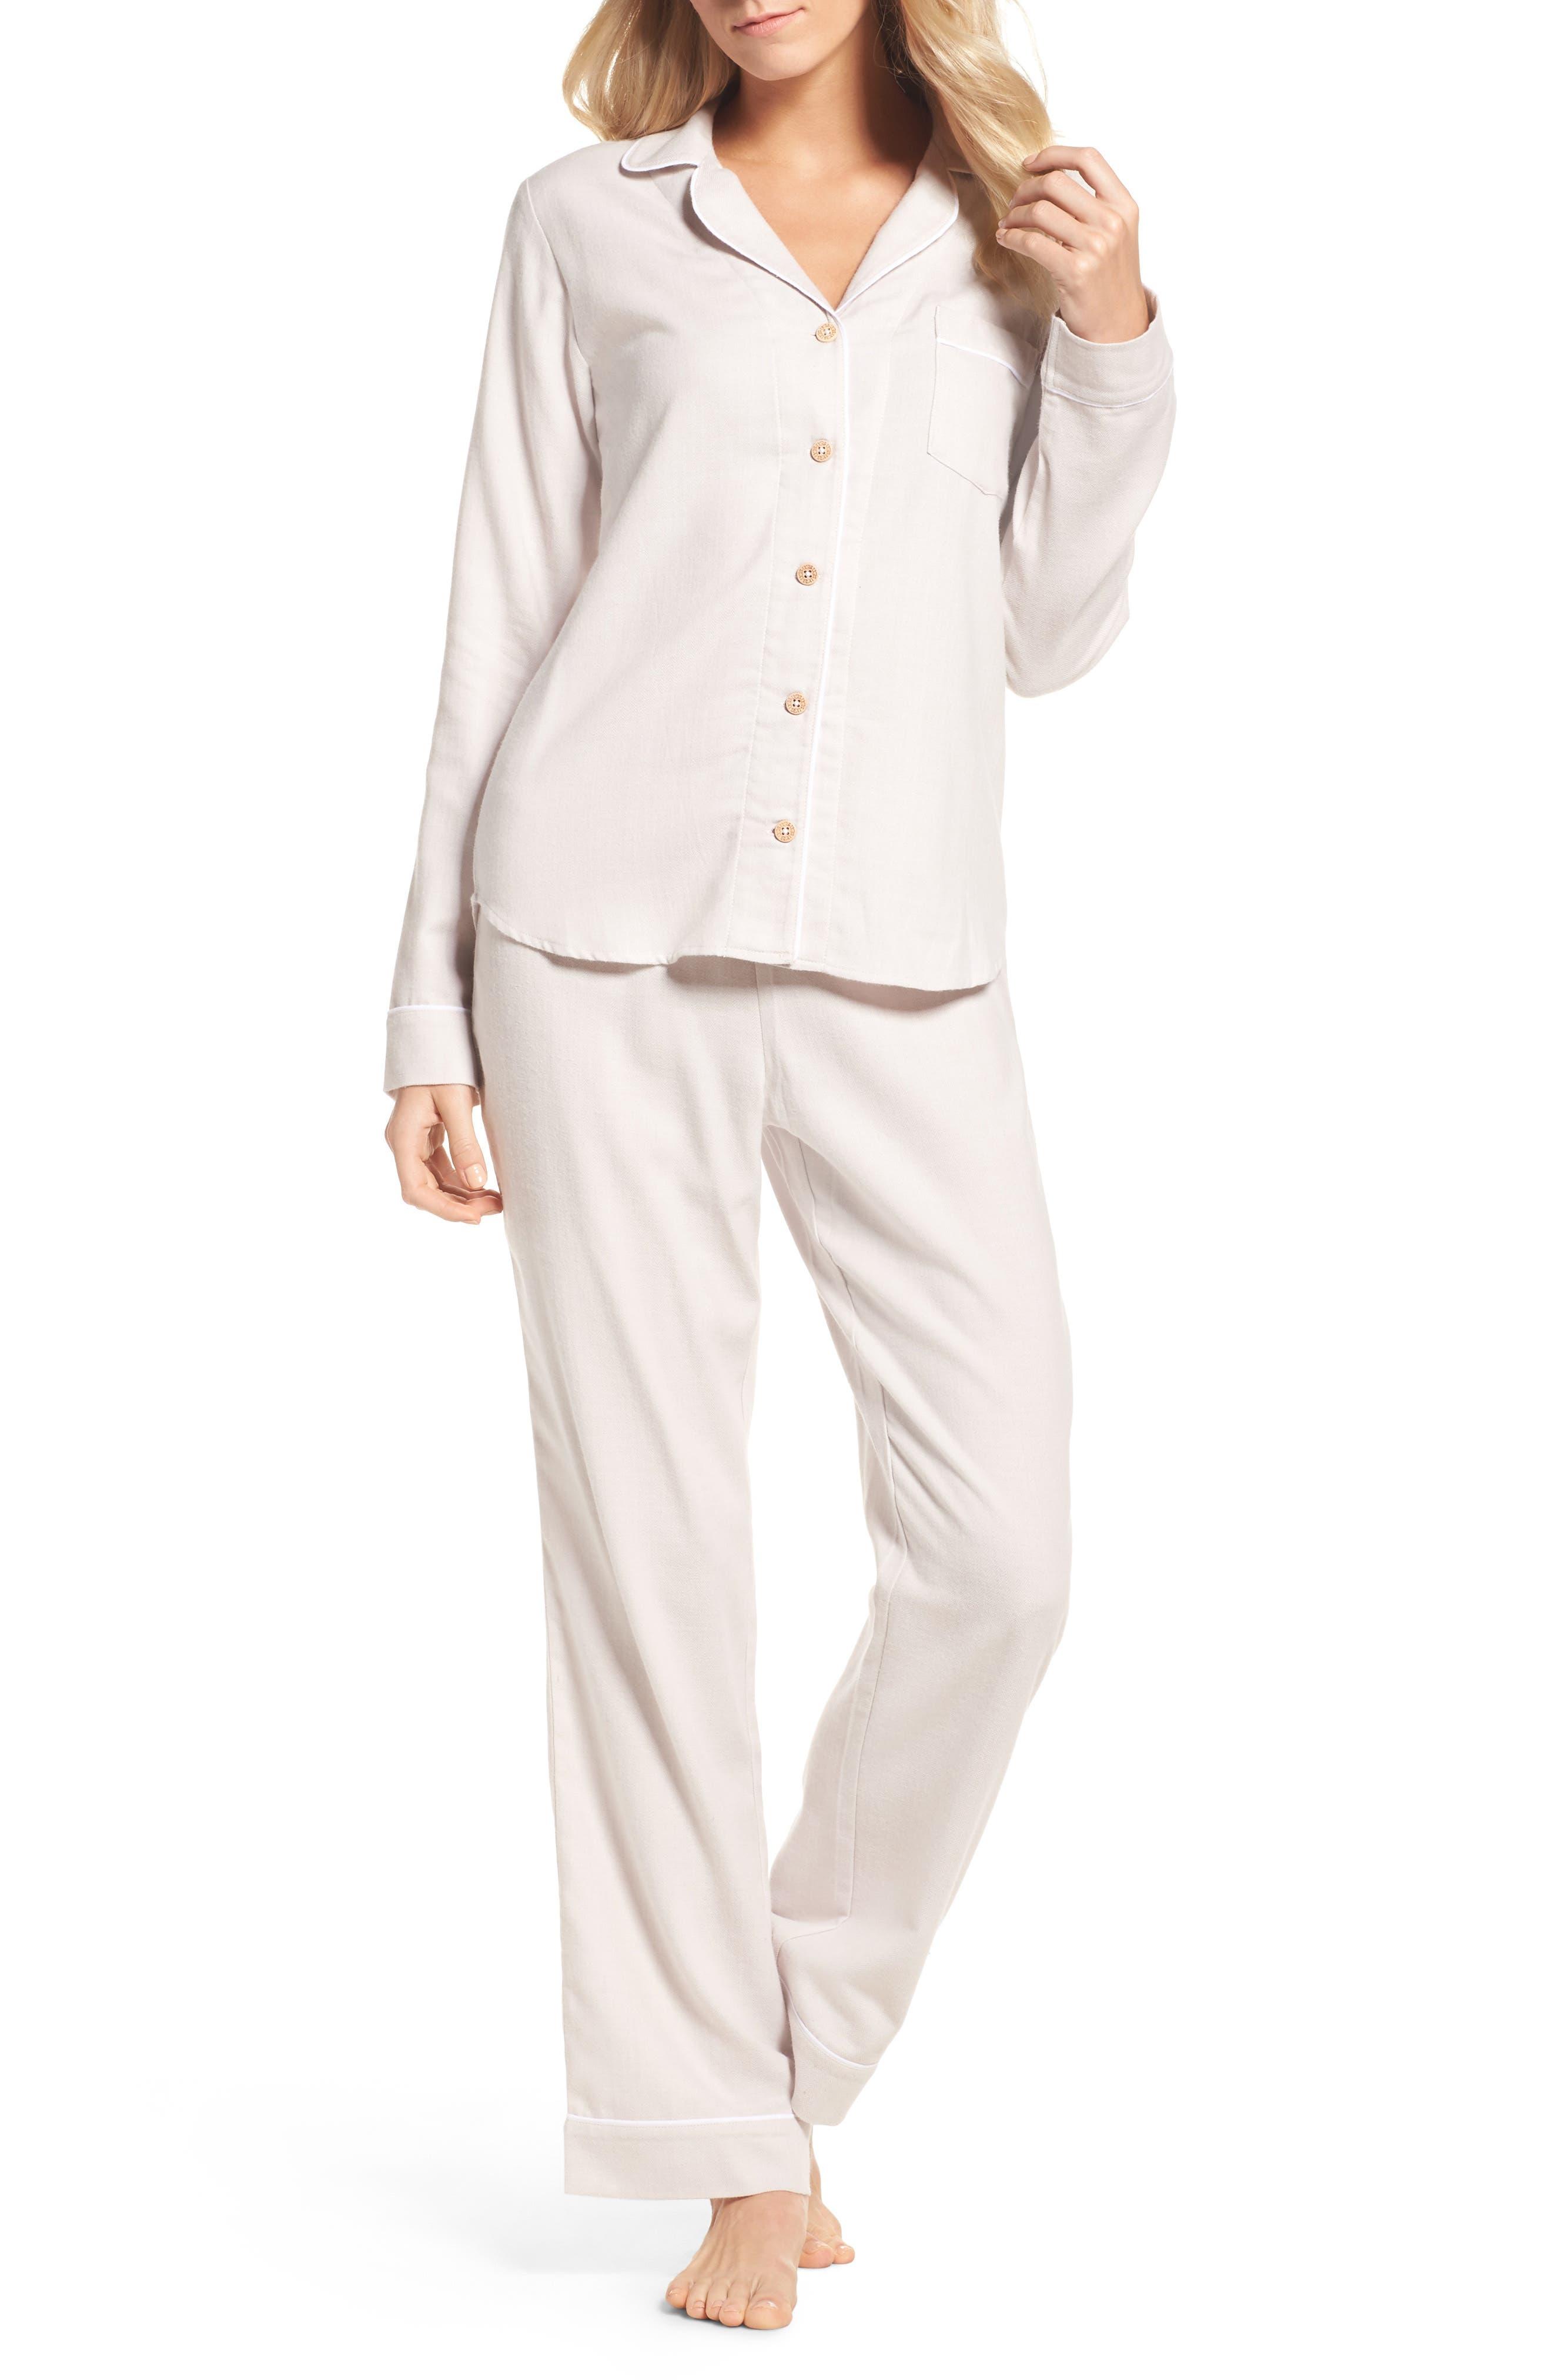 Raven Herringbone Pajamas,                             Main thumbnail 1, color,                             Ivory